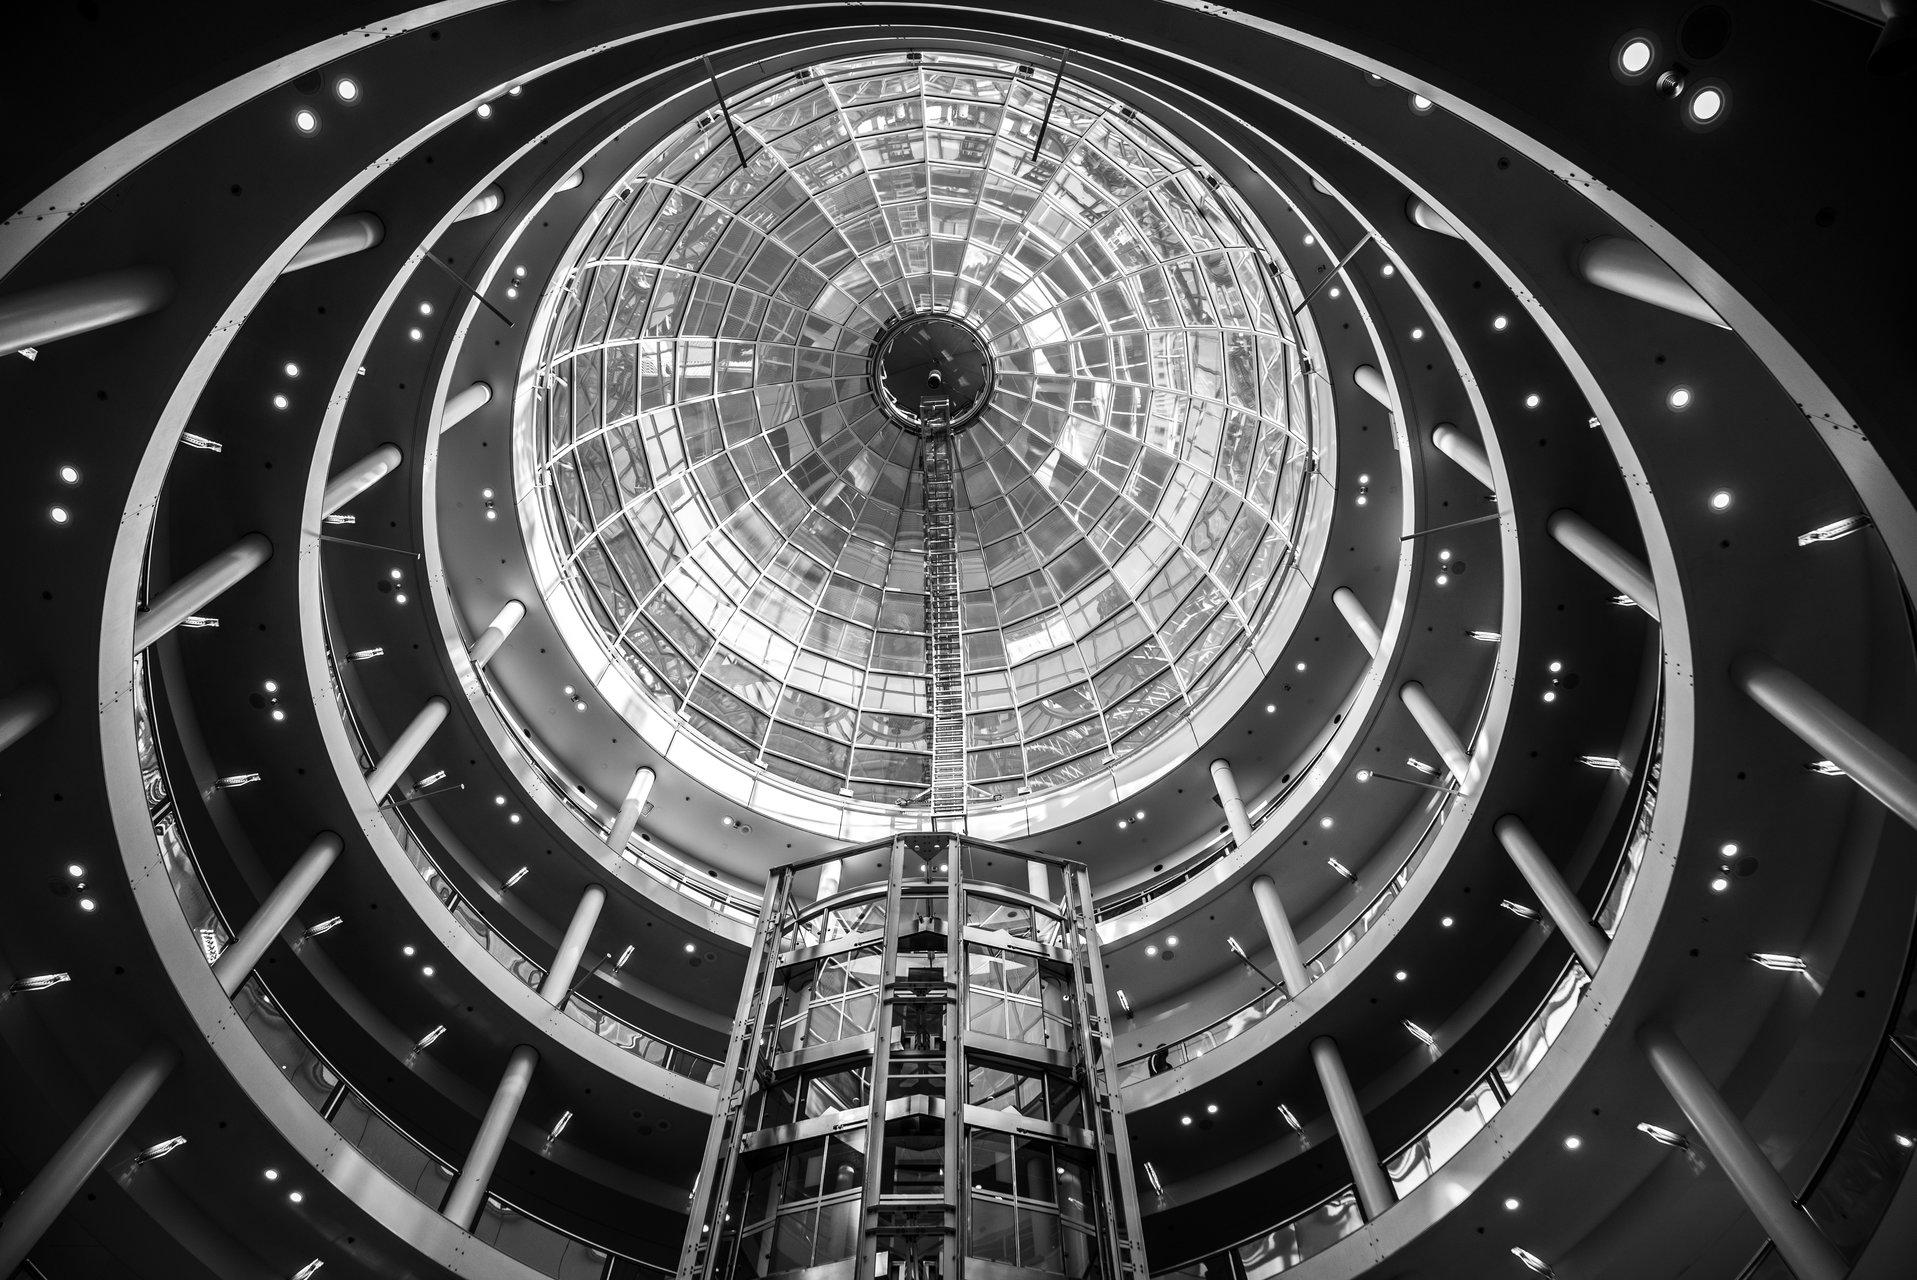 Photo in Architecture | Author stoyan dragiev - s.b.d. | PHOTO FORUM